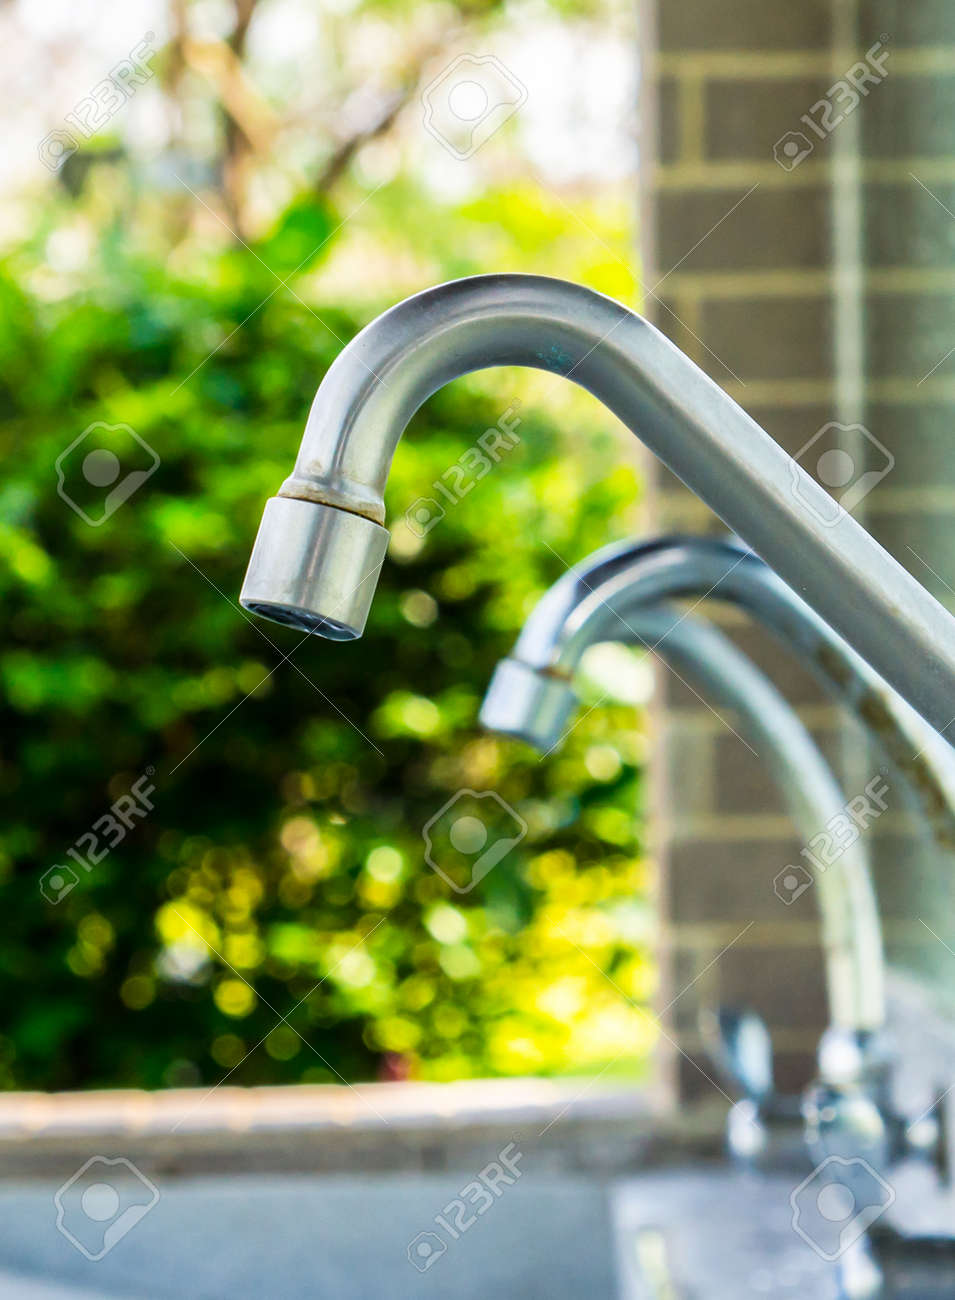 Beautiful Tap Outdoor Illustration - Water Faucet Ideas - rirakuya.info